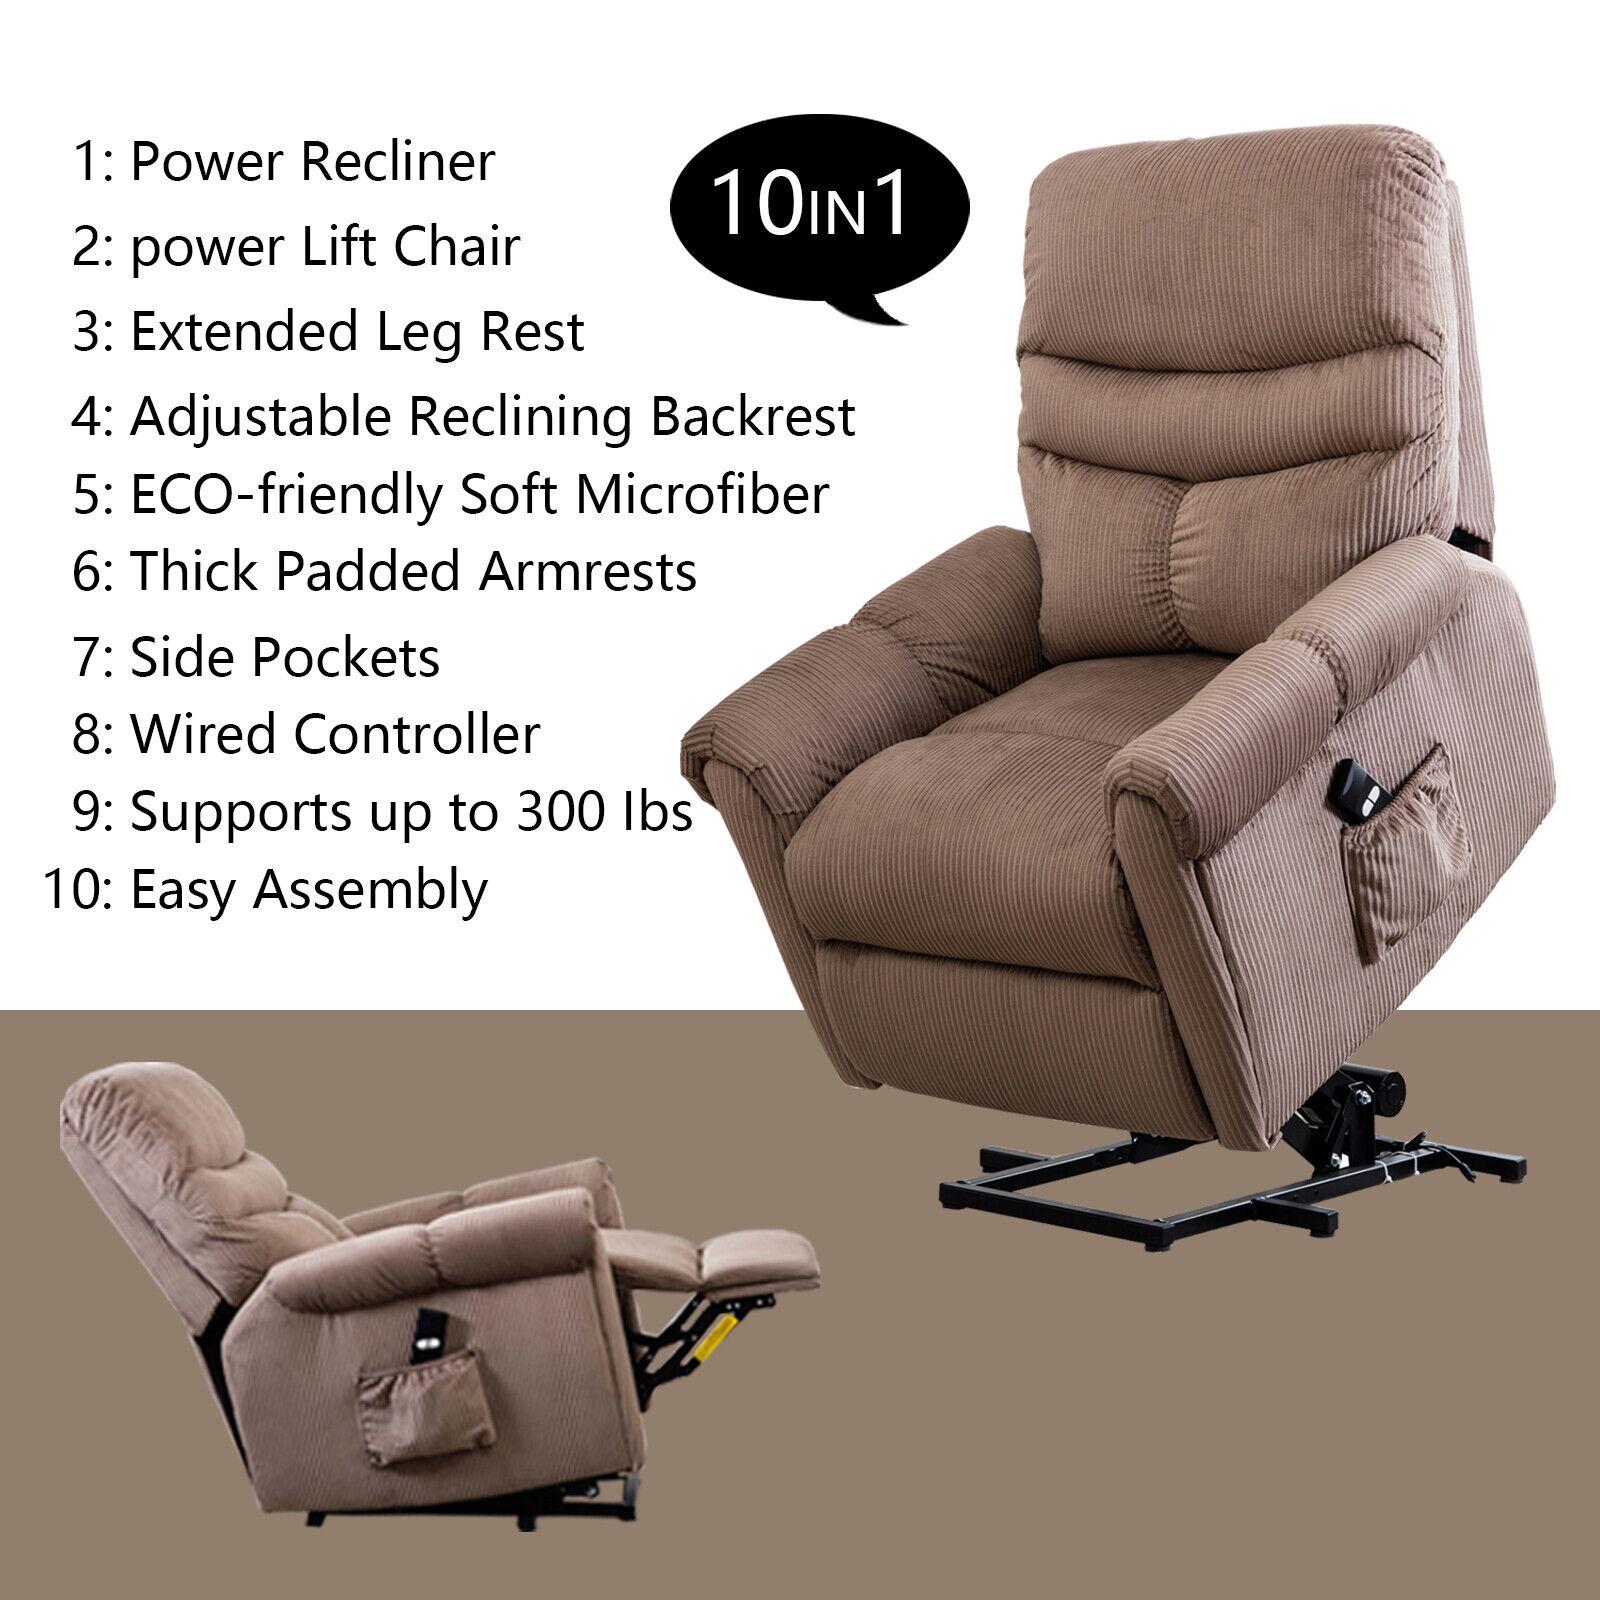 Electric Power Lift Chair Recliner Antiskid Fabric Reclining Lazy Man Sofa wRC